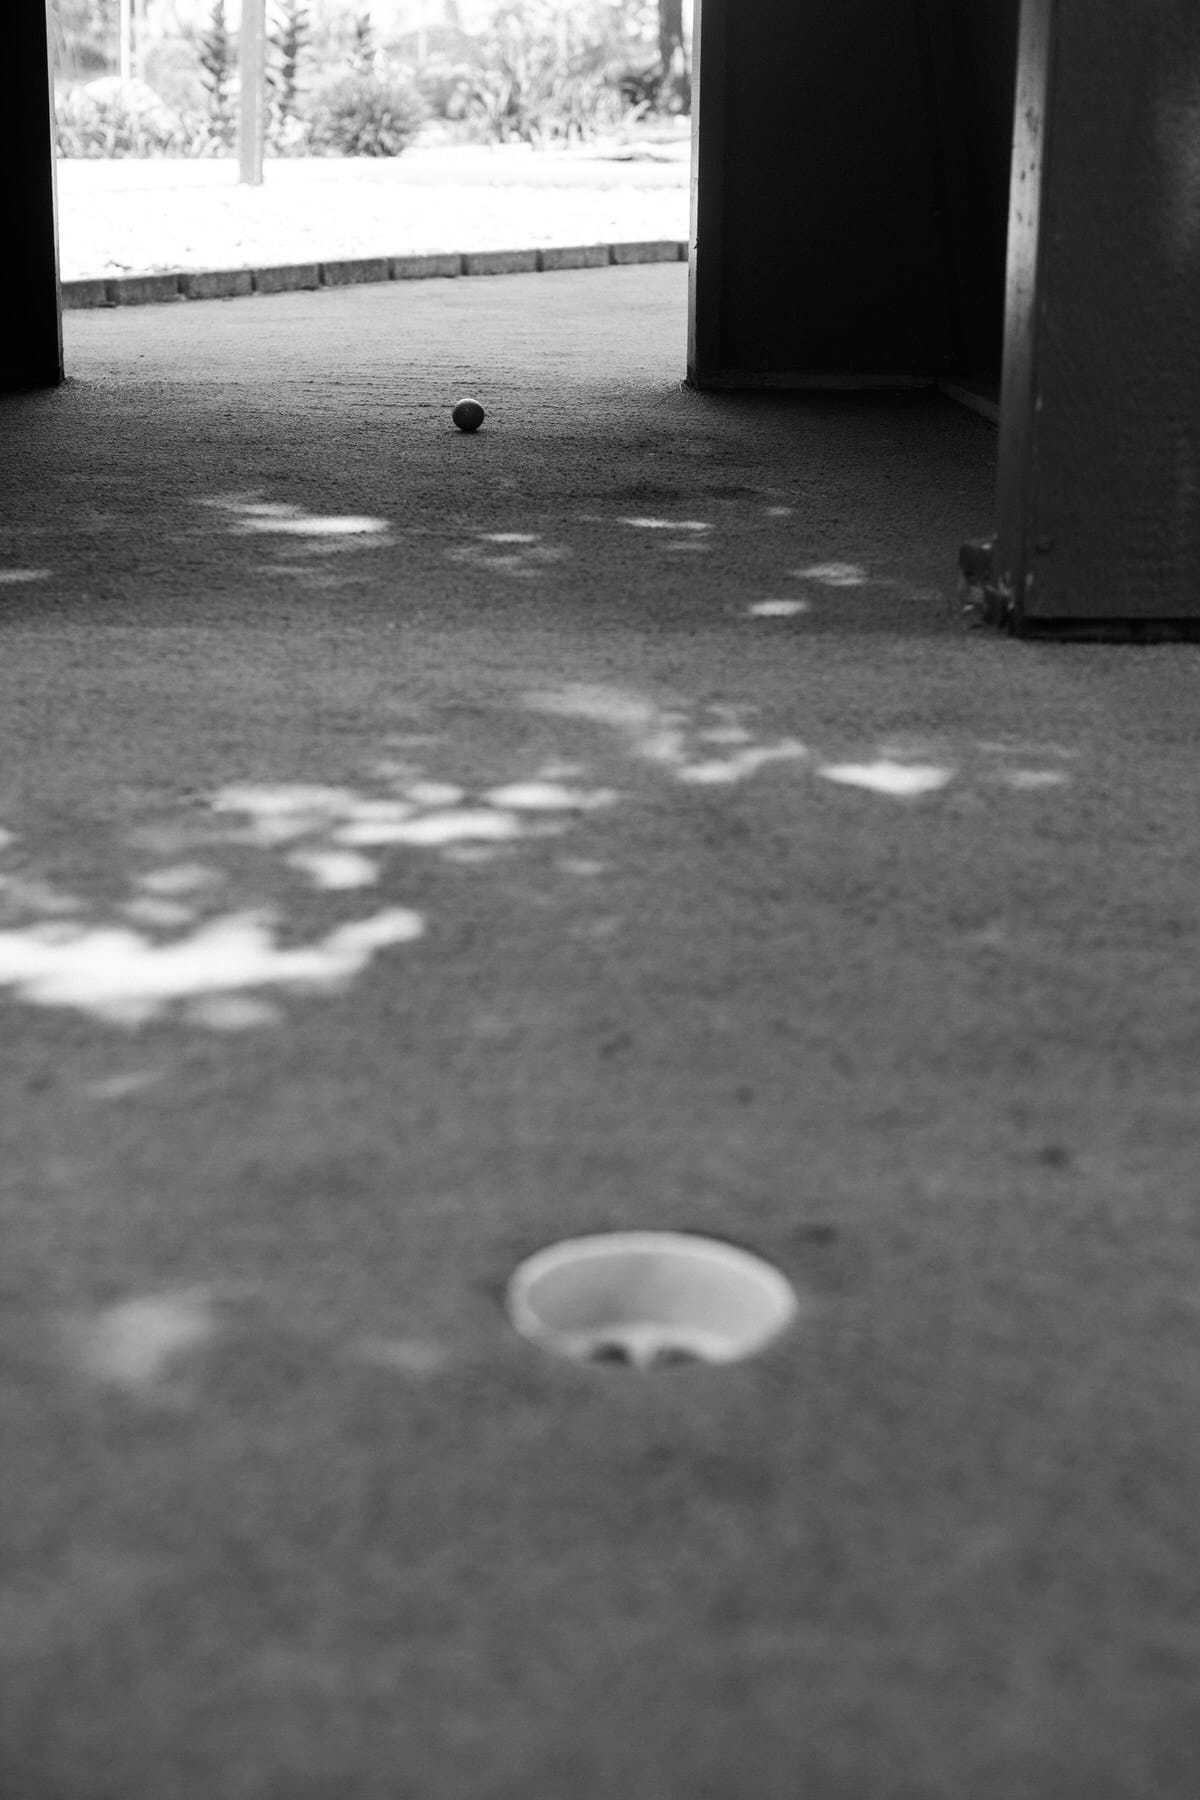 mini-golf-Crivitz-Wisconsin-black-and-white-fine-art-photography-by-Studio-L-photographer-Laura-Schneider-_9661